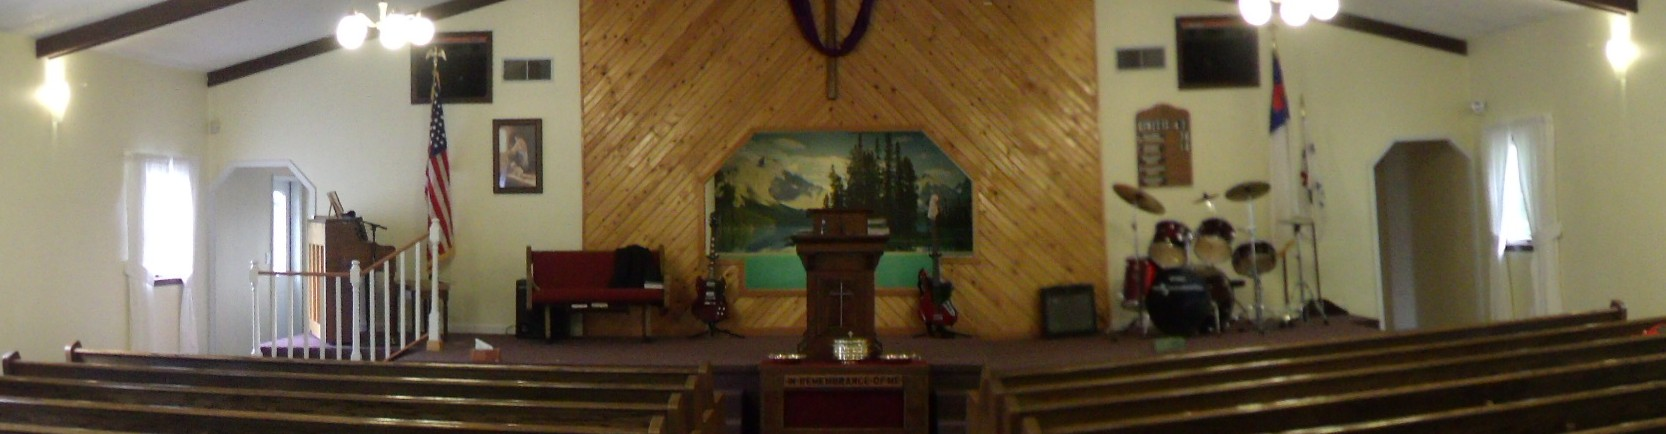 Romulus Free Will Baptist Church